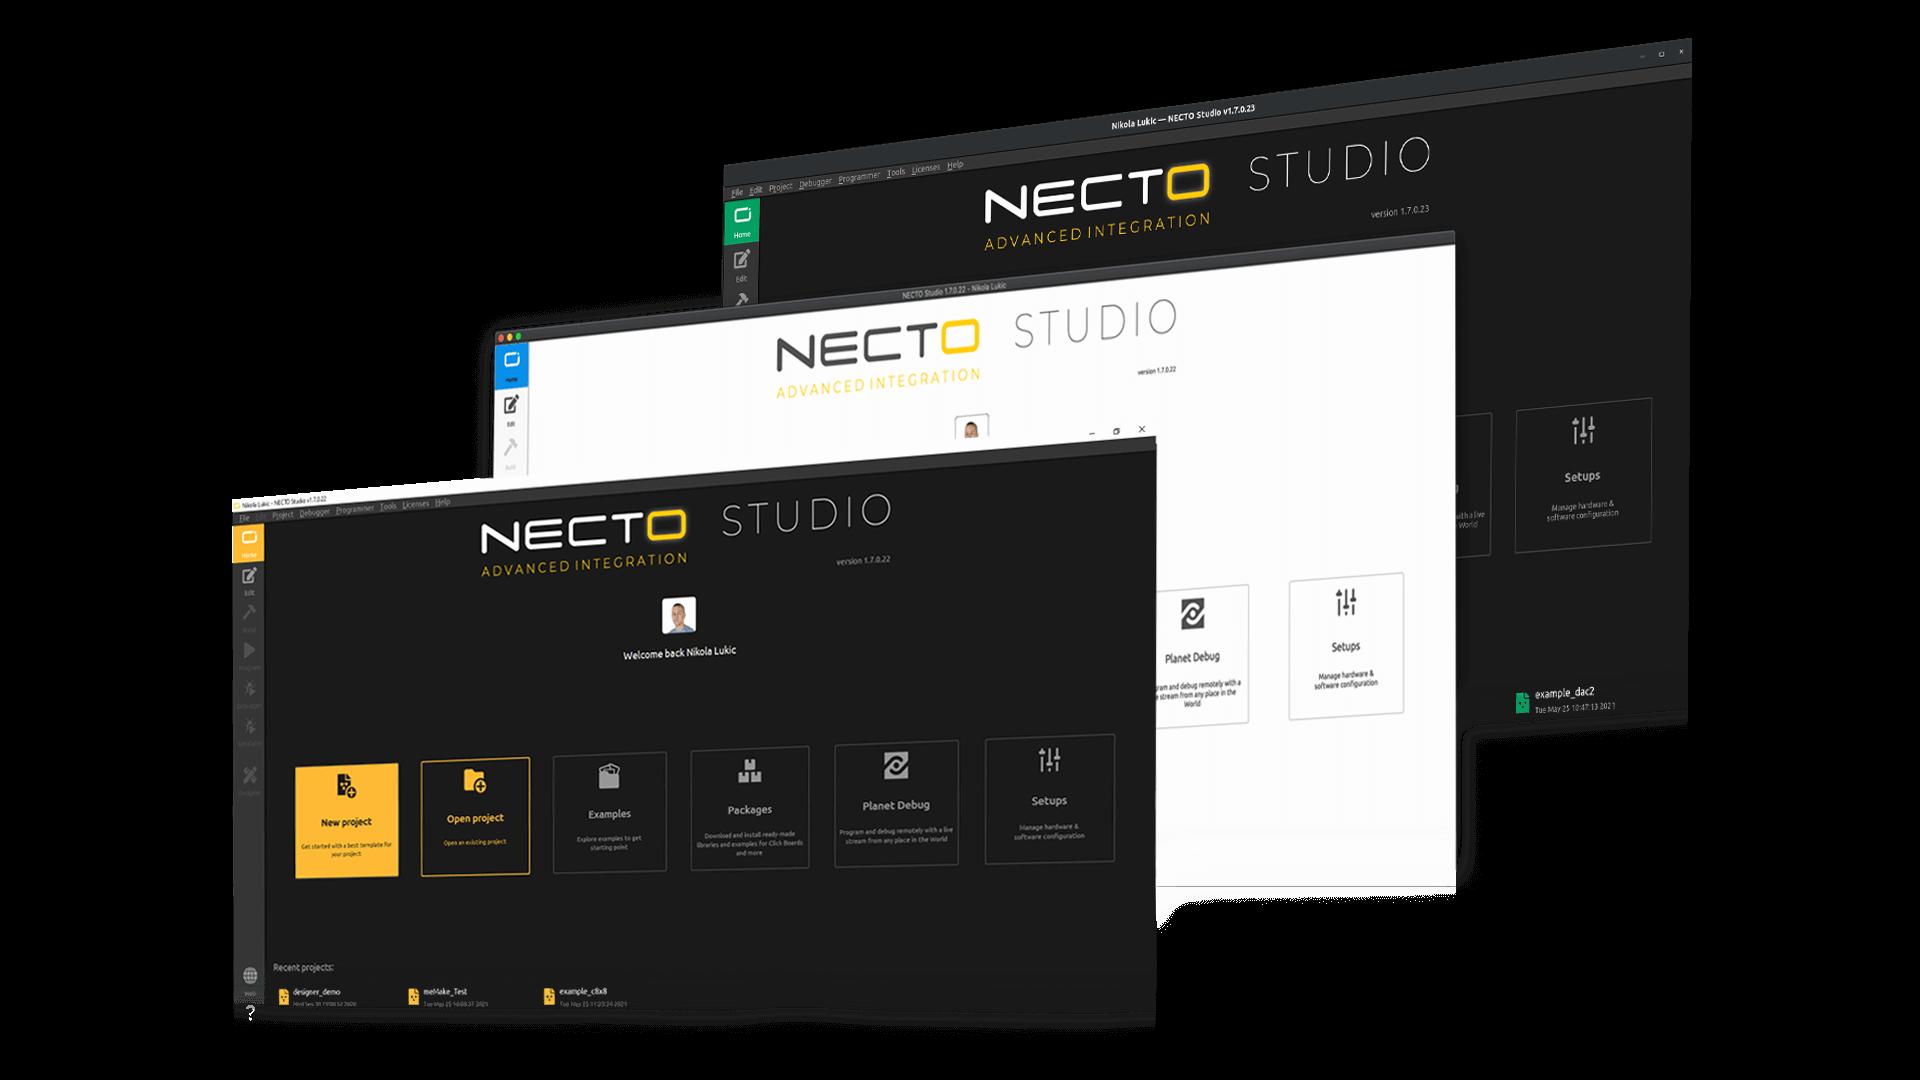 necto studio cross platform mac